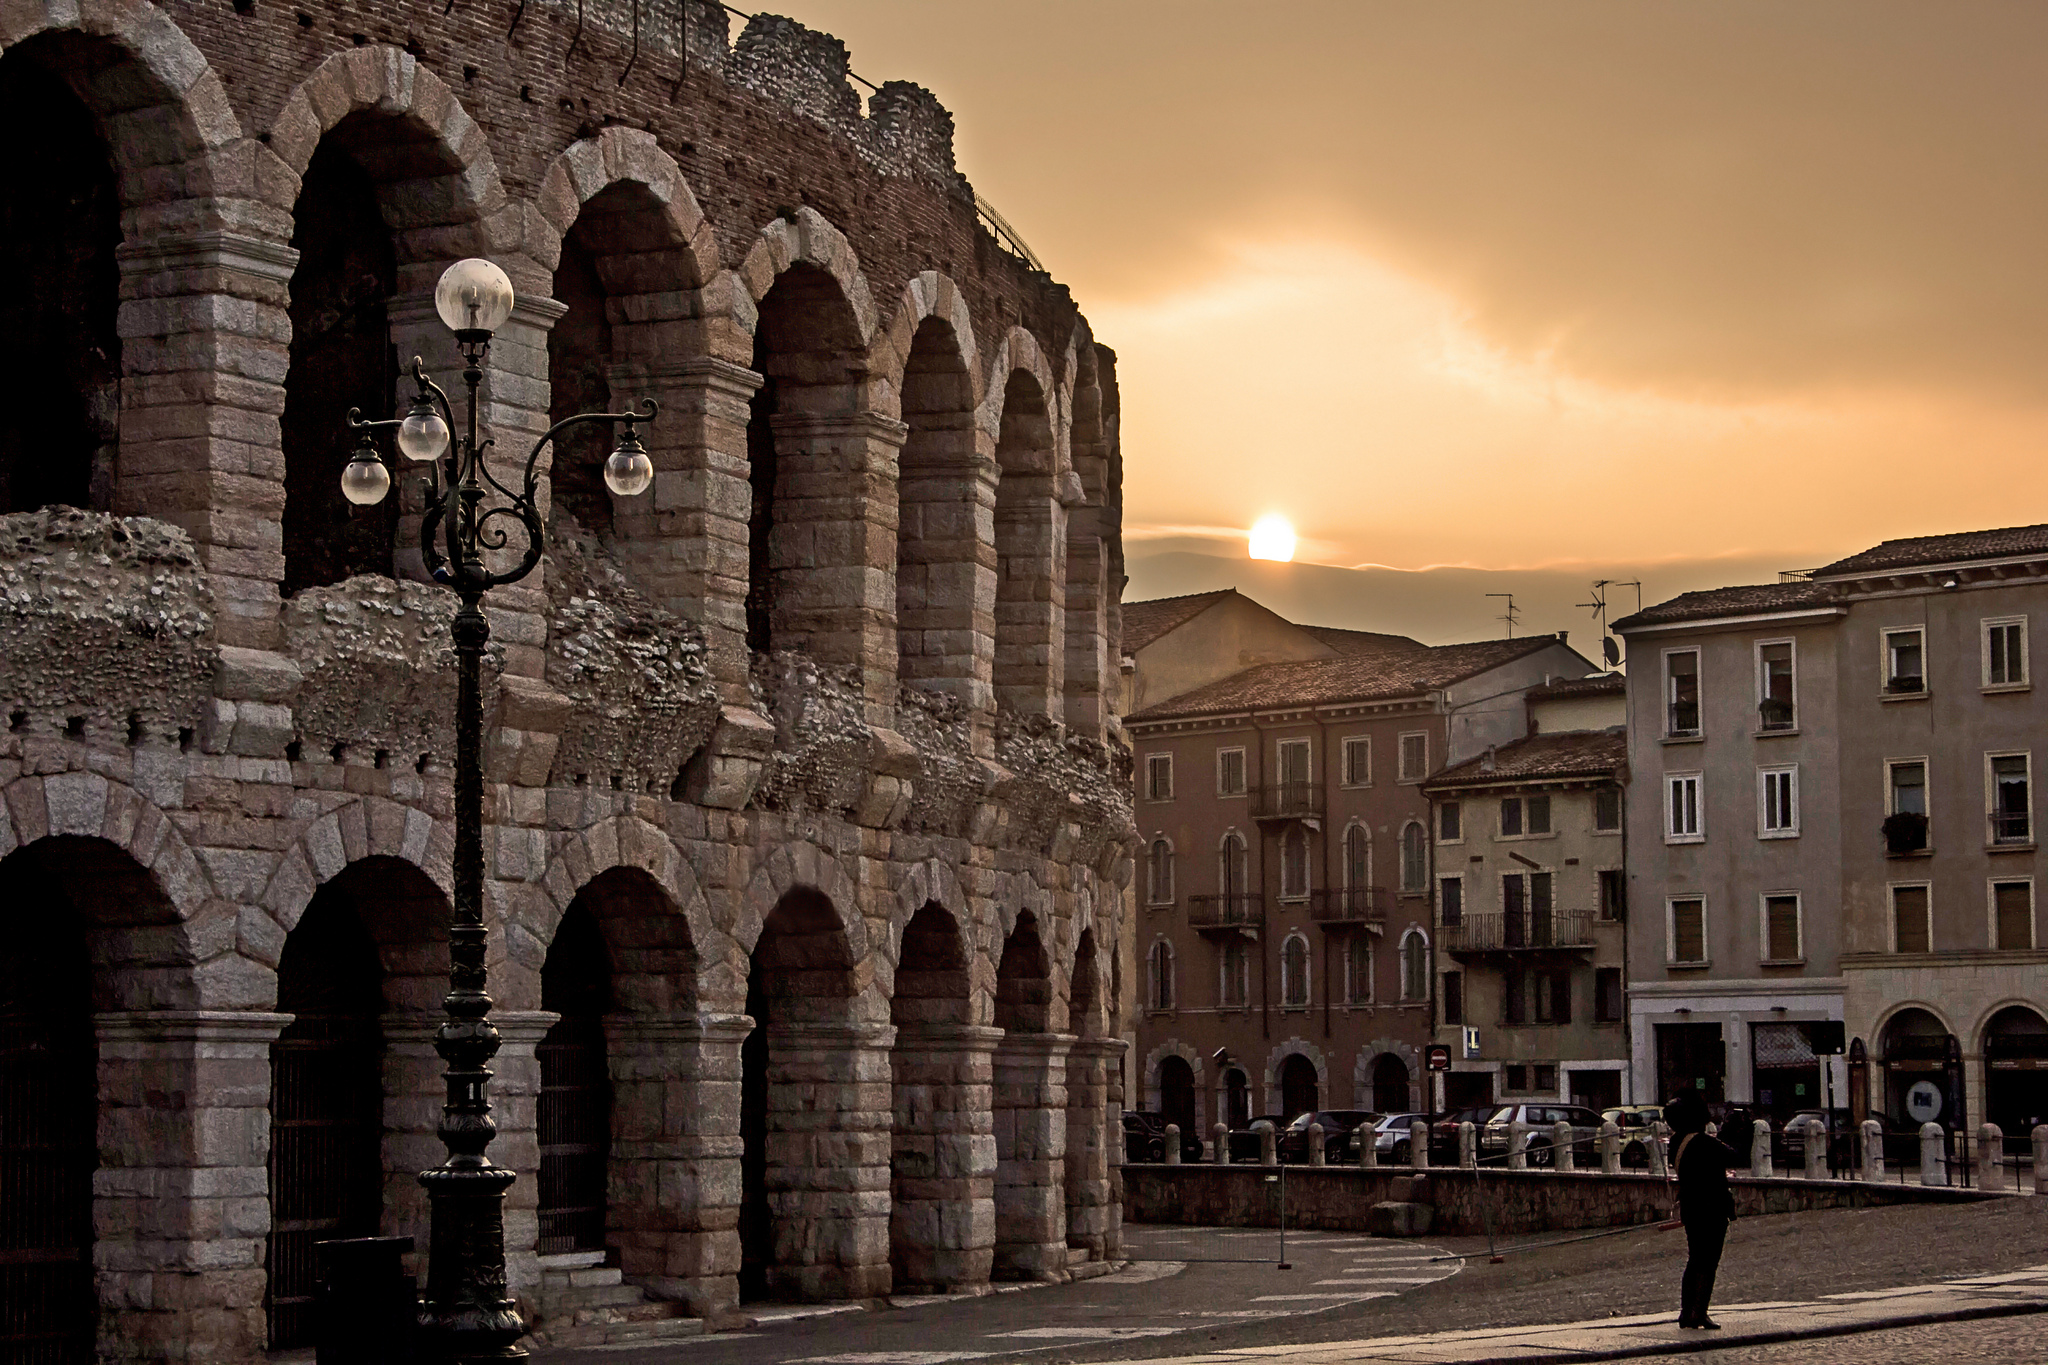 arena_di_verona_original_theatr1